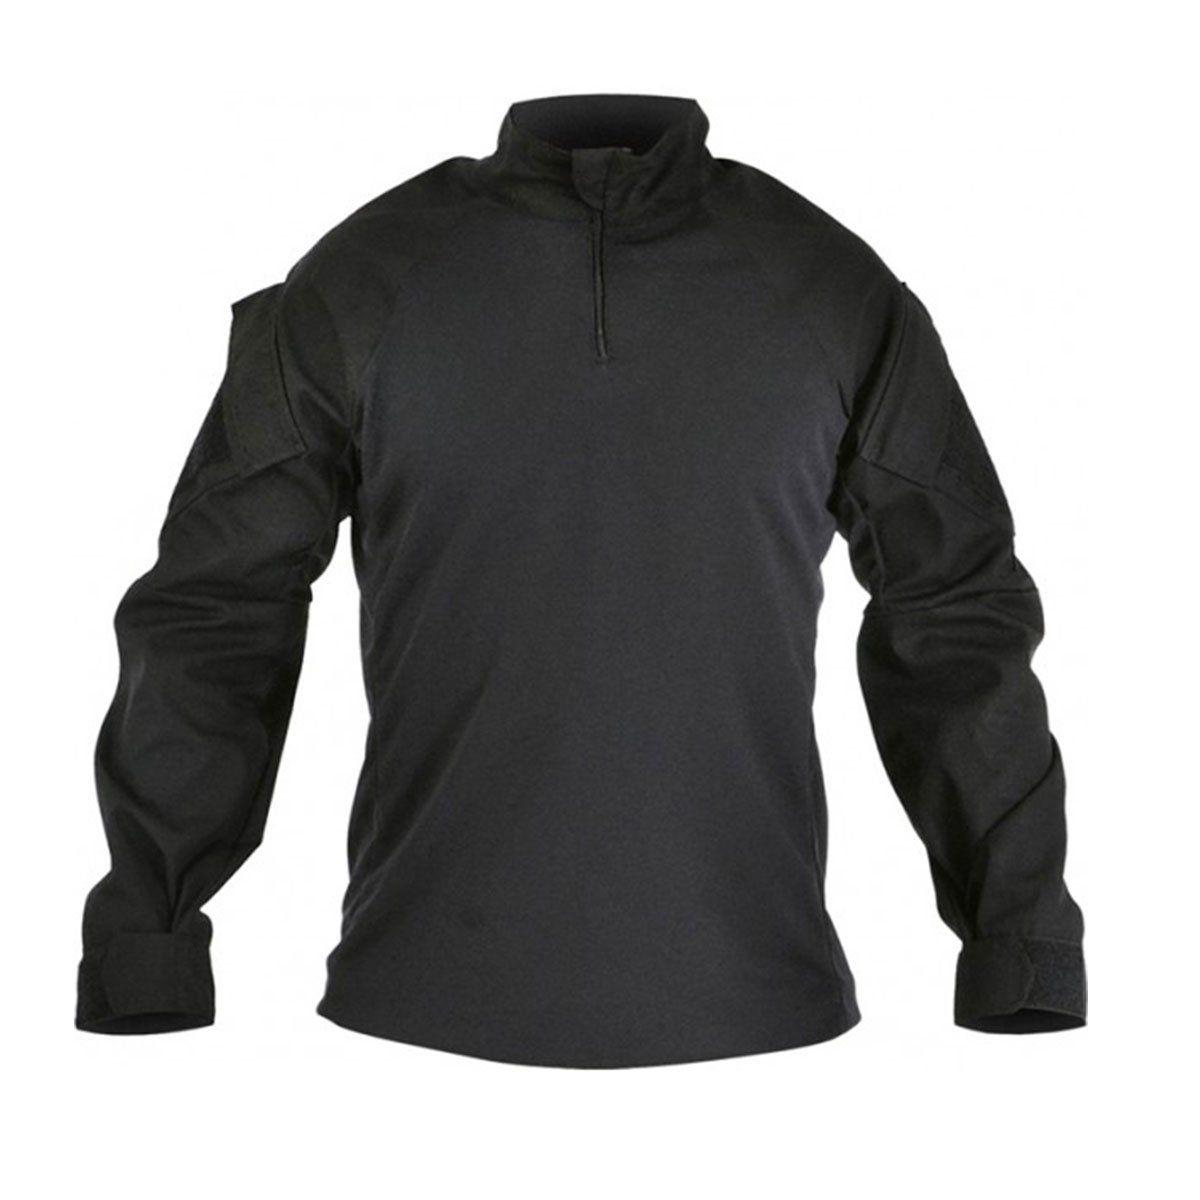 Combat Shirt For Honor Black